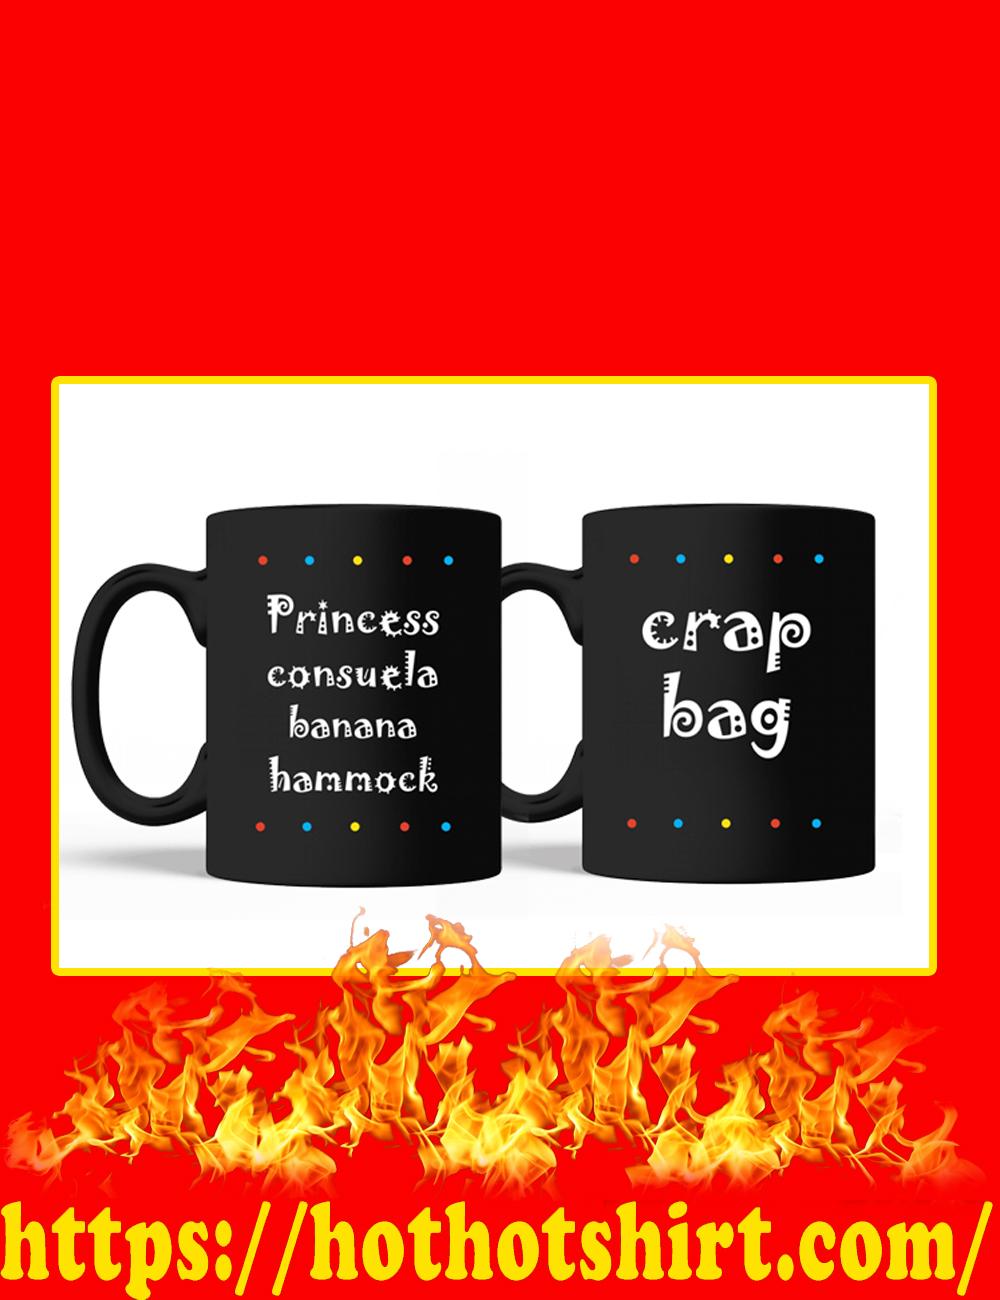 Princess Consuela Banana Hammock Crap Bag Mug-black